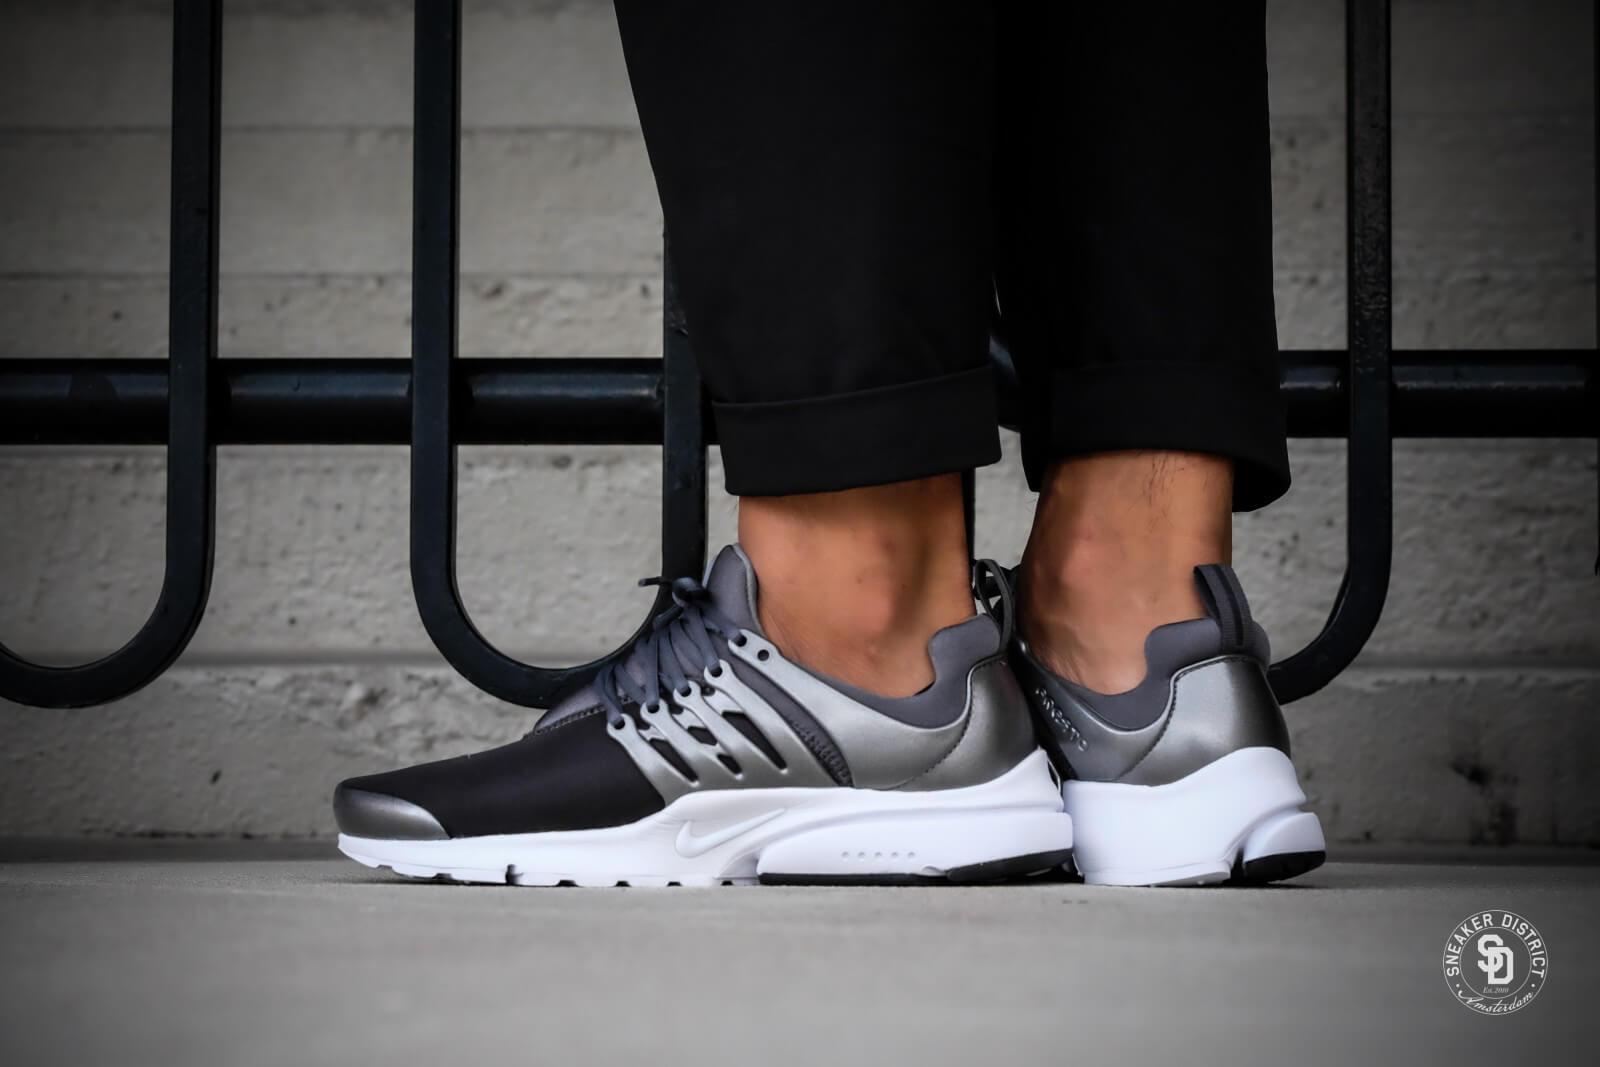 Nike Air Presto Premium Metallic Hematite Cool Grey 848141 003